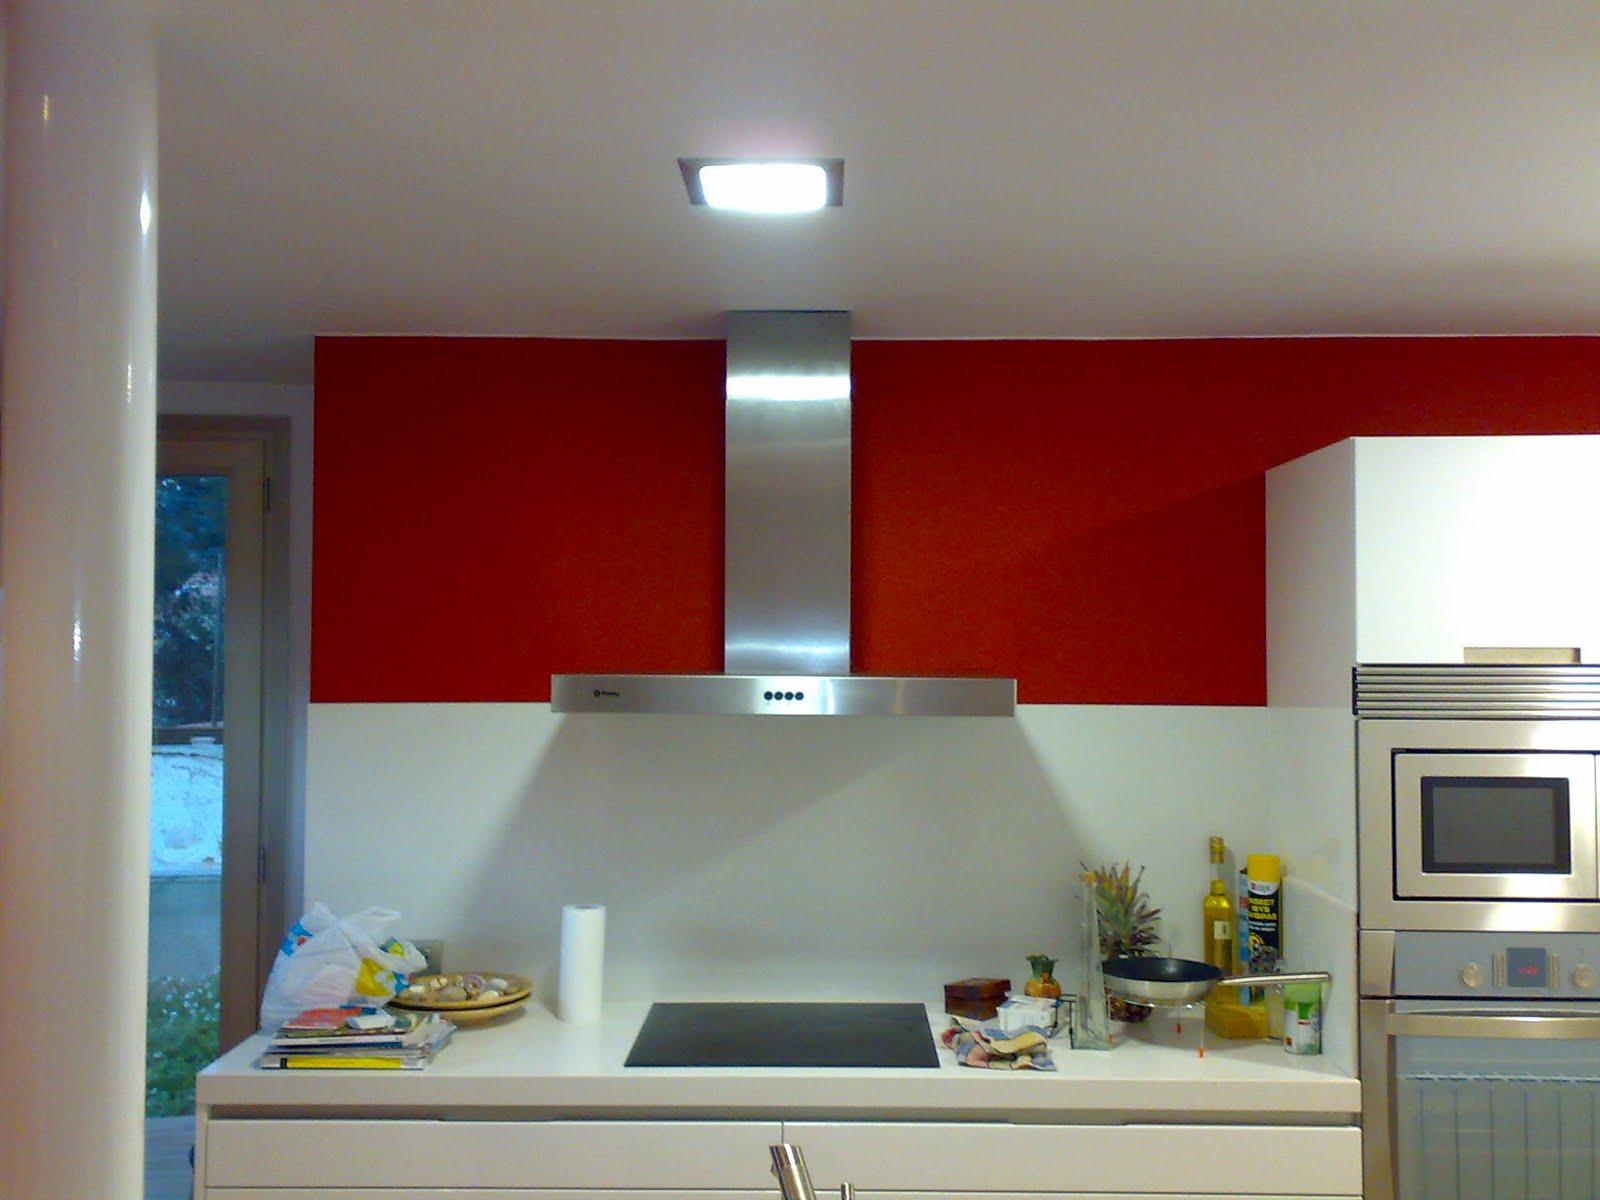 Dicopint 2002 s c l cocina en rojo - Pared cocina pintada ...